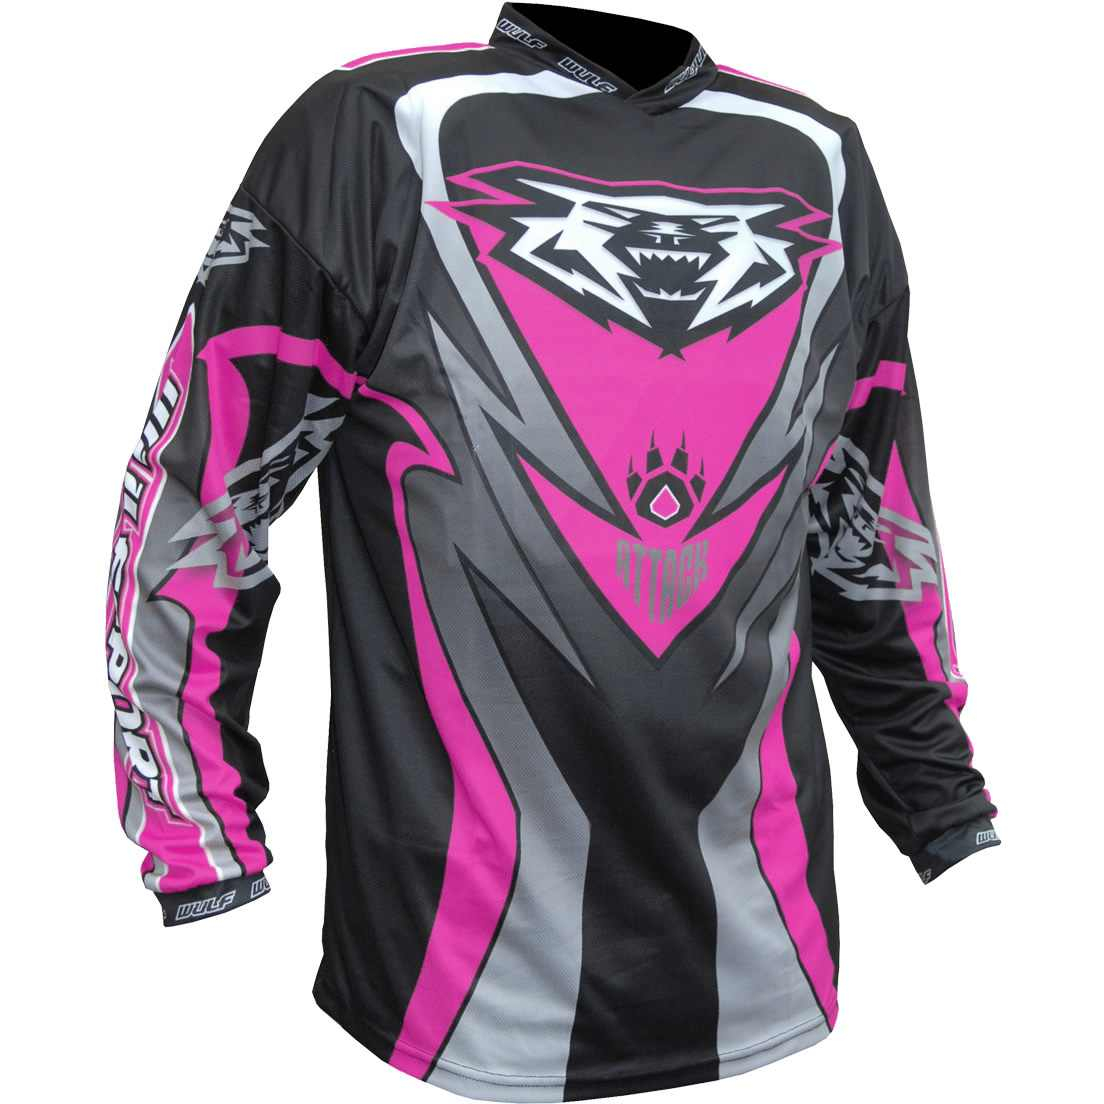 Wulfsport ATTACK Cub Race Shirt - Pink